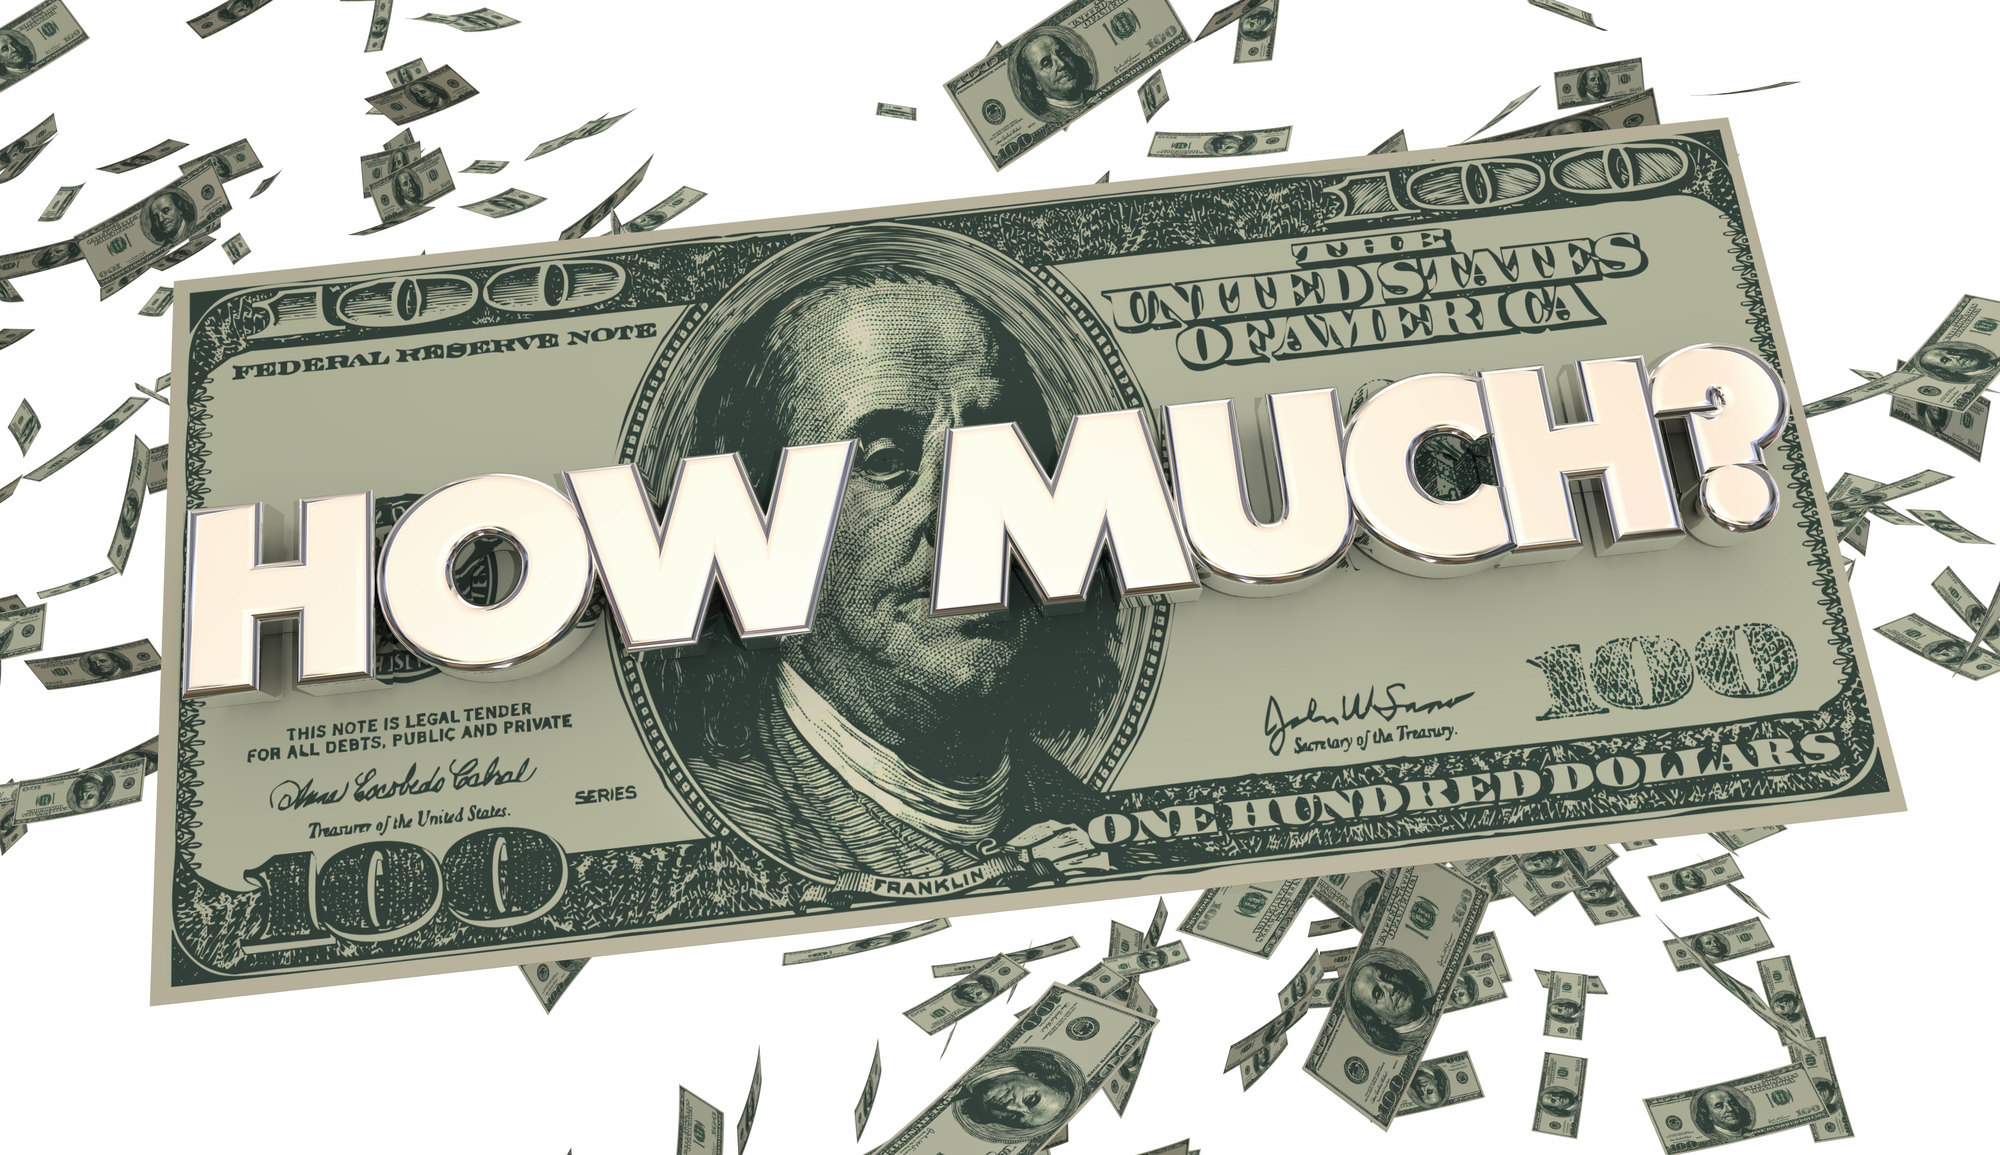 How Much Money Illustration